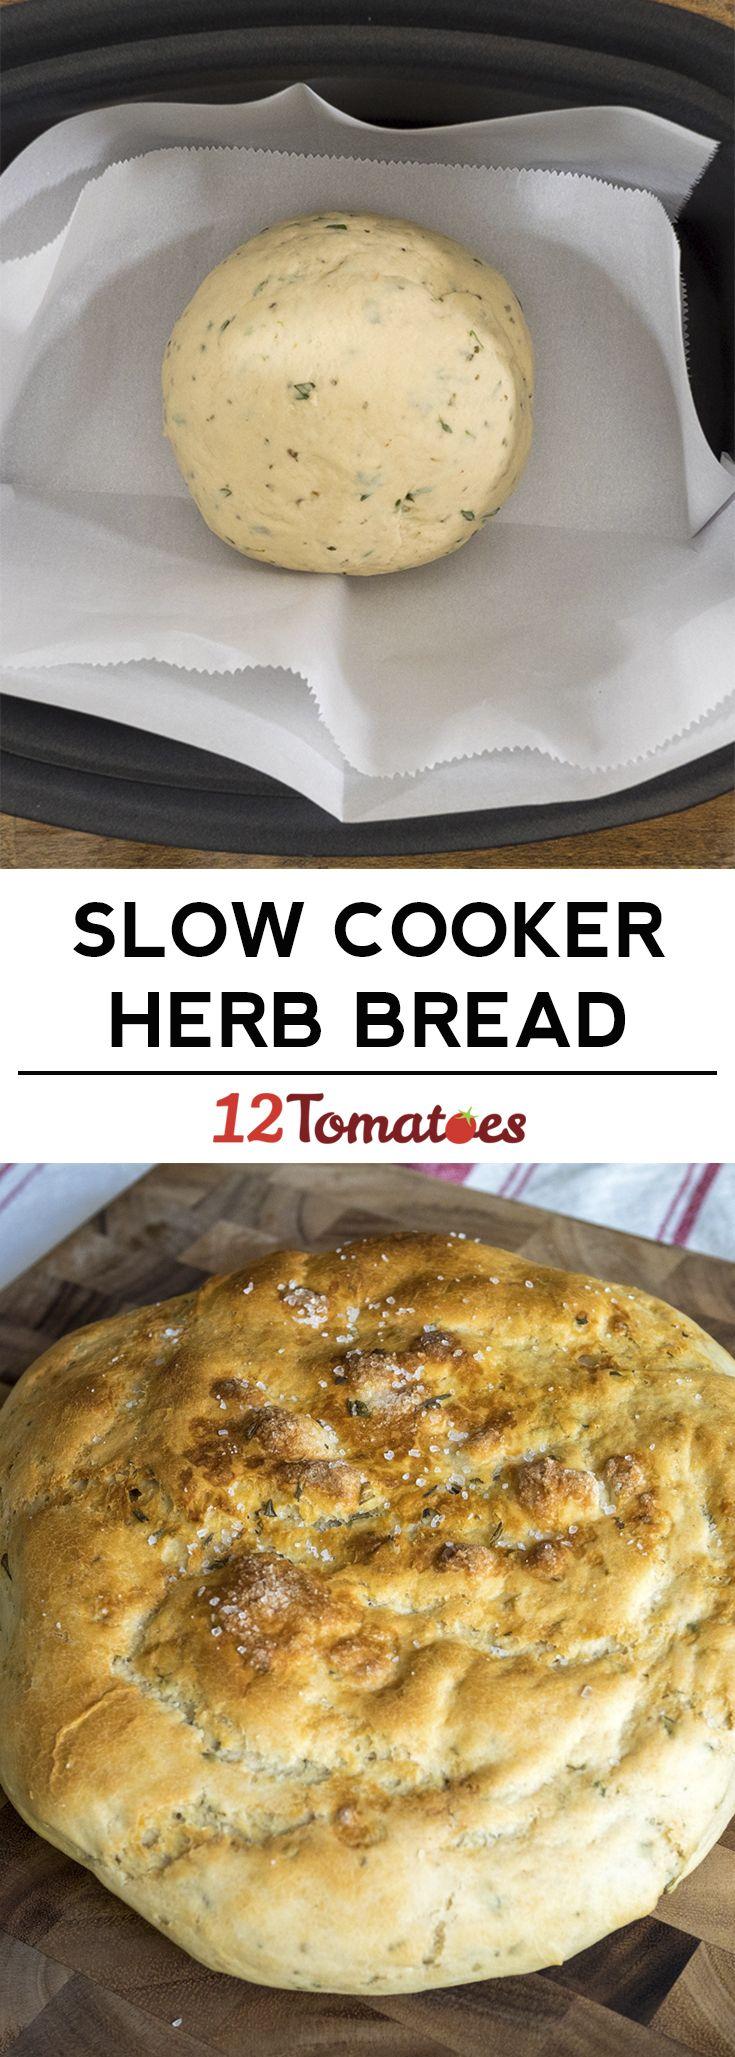 Slow cooker herb bread